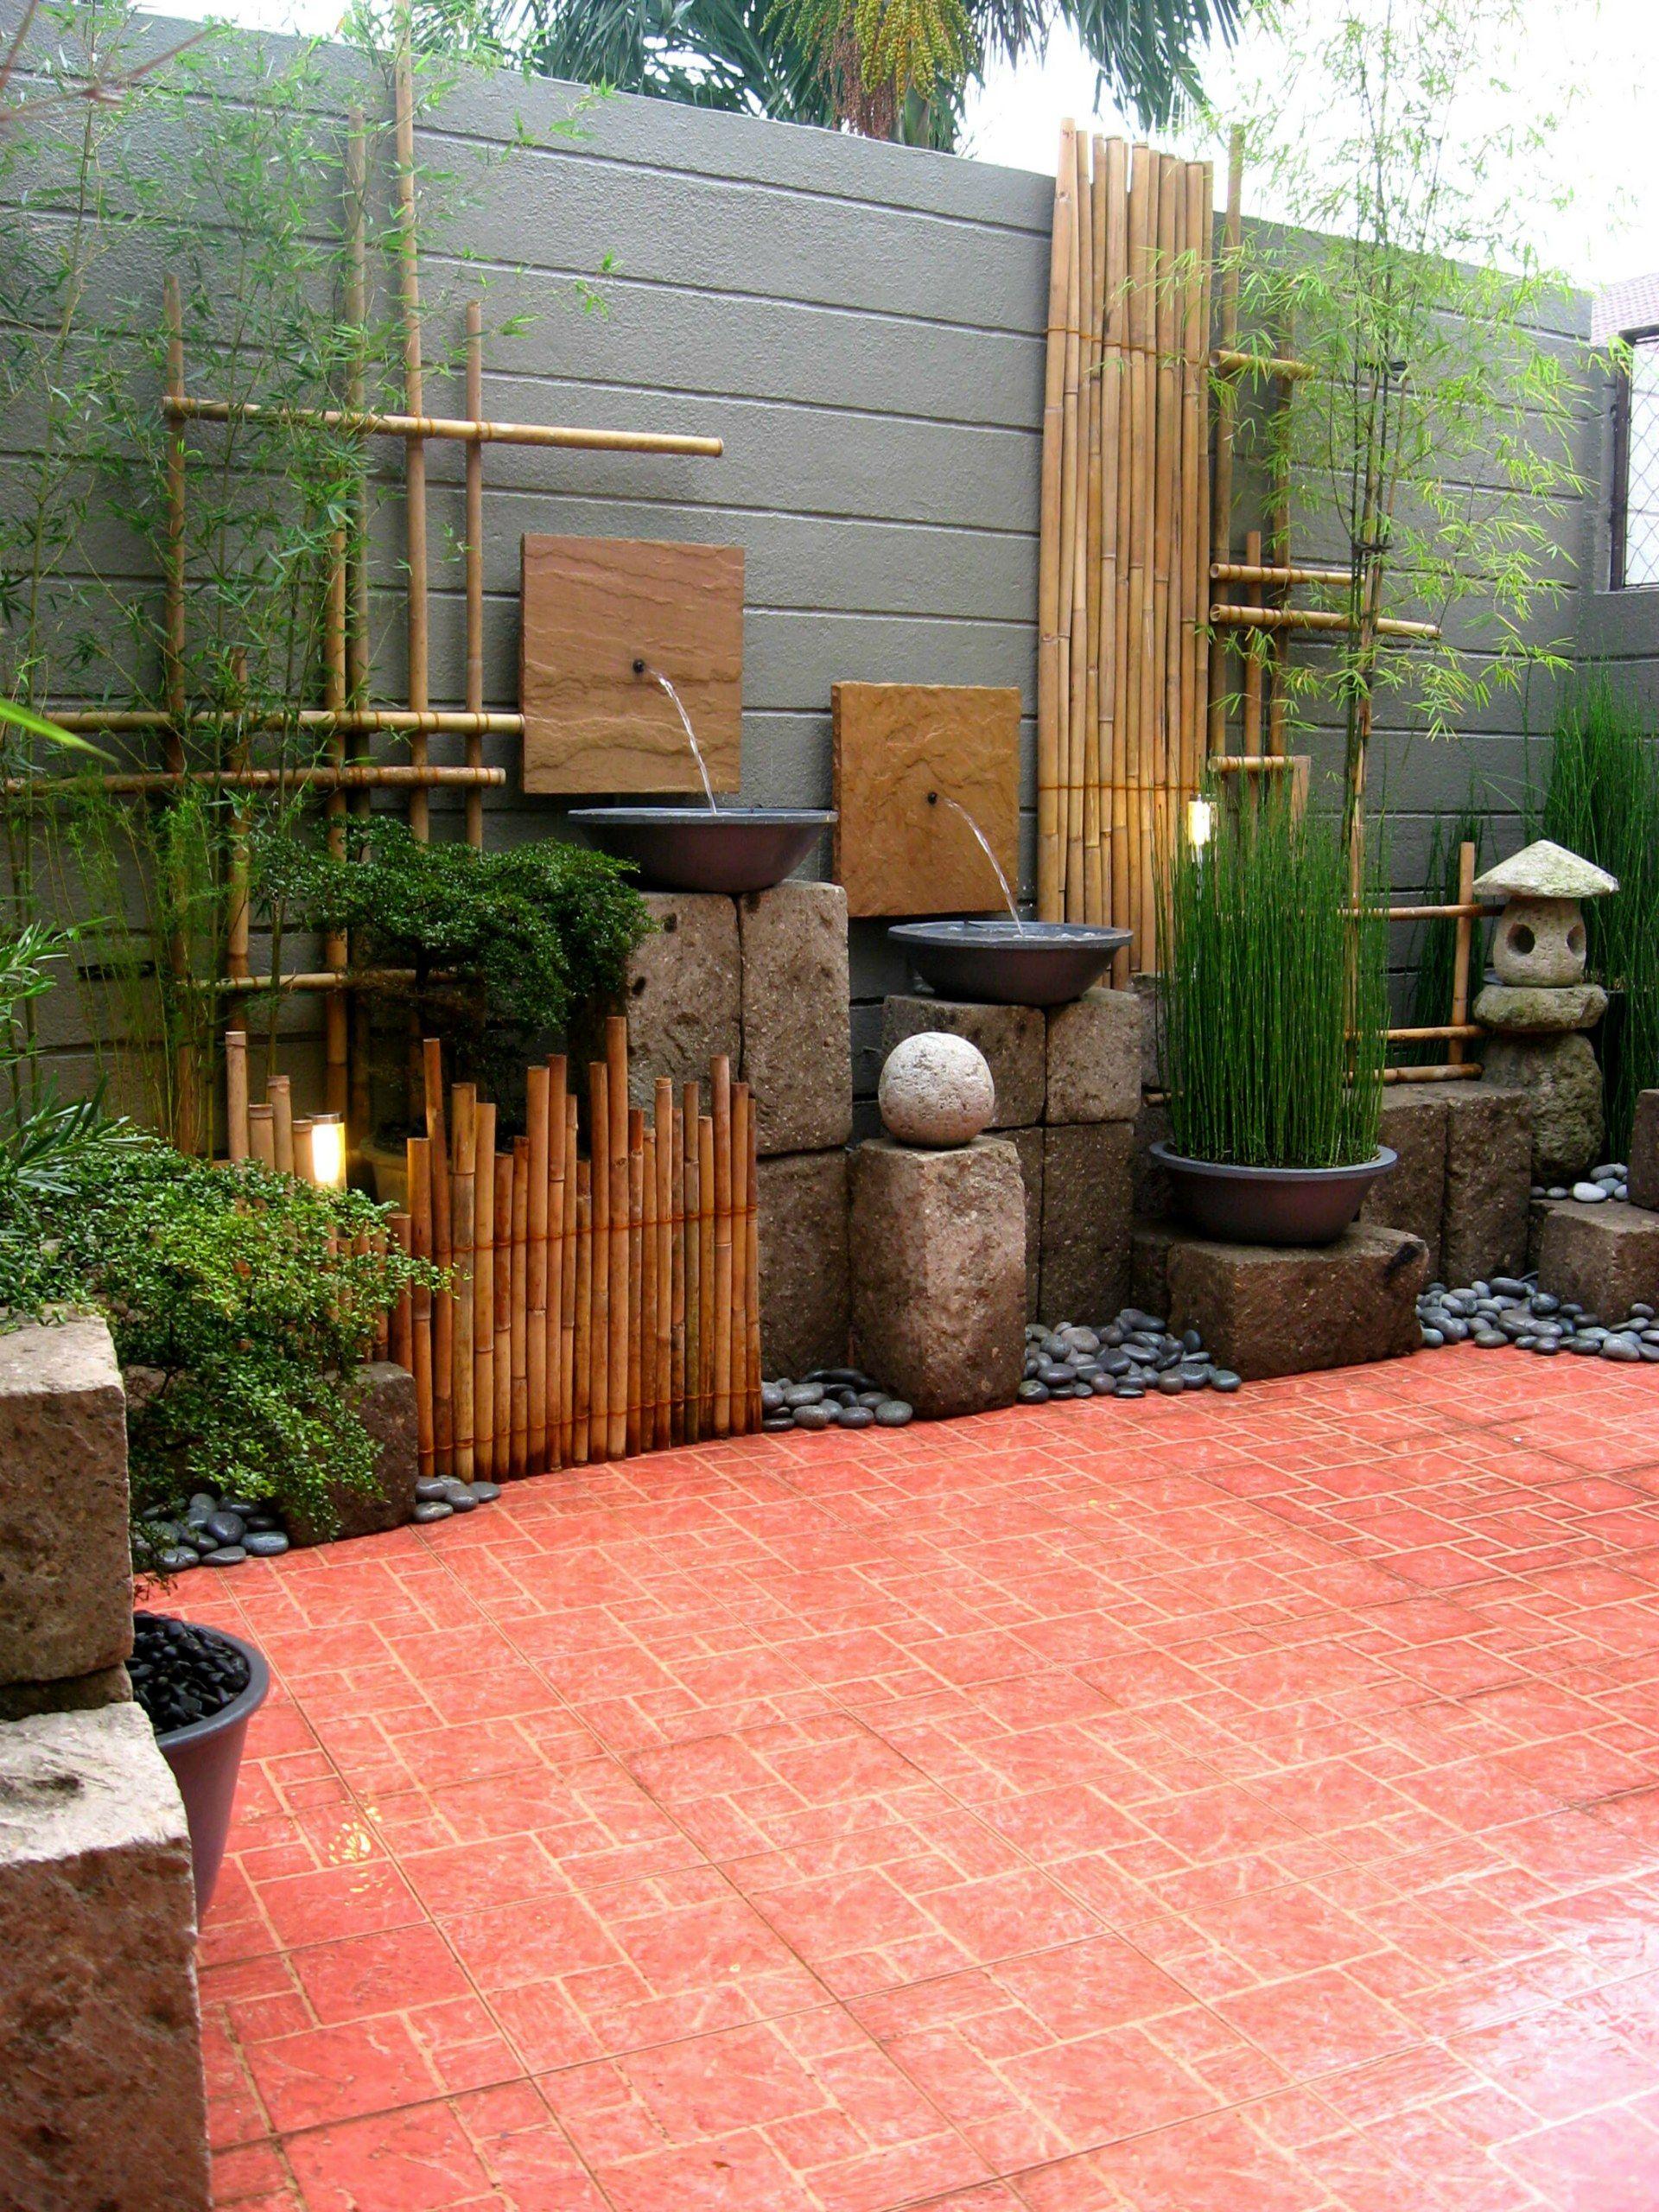 Landscape Wall Design Ideas From Primescape Philippines Small Garden Landscape Japanese Garden Landscape Front Yard Landscaping Design